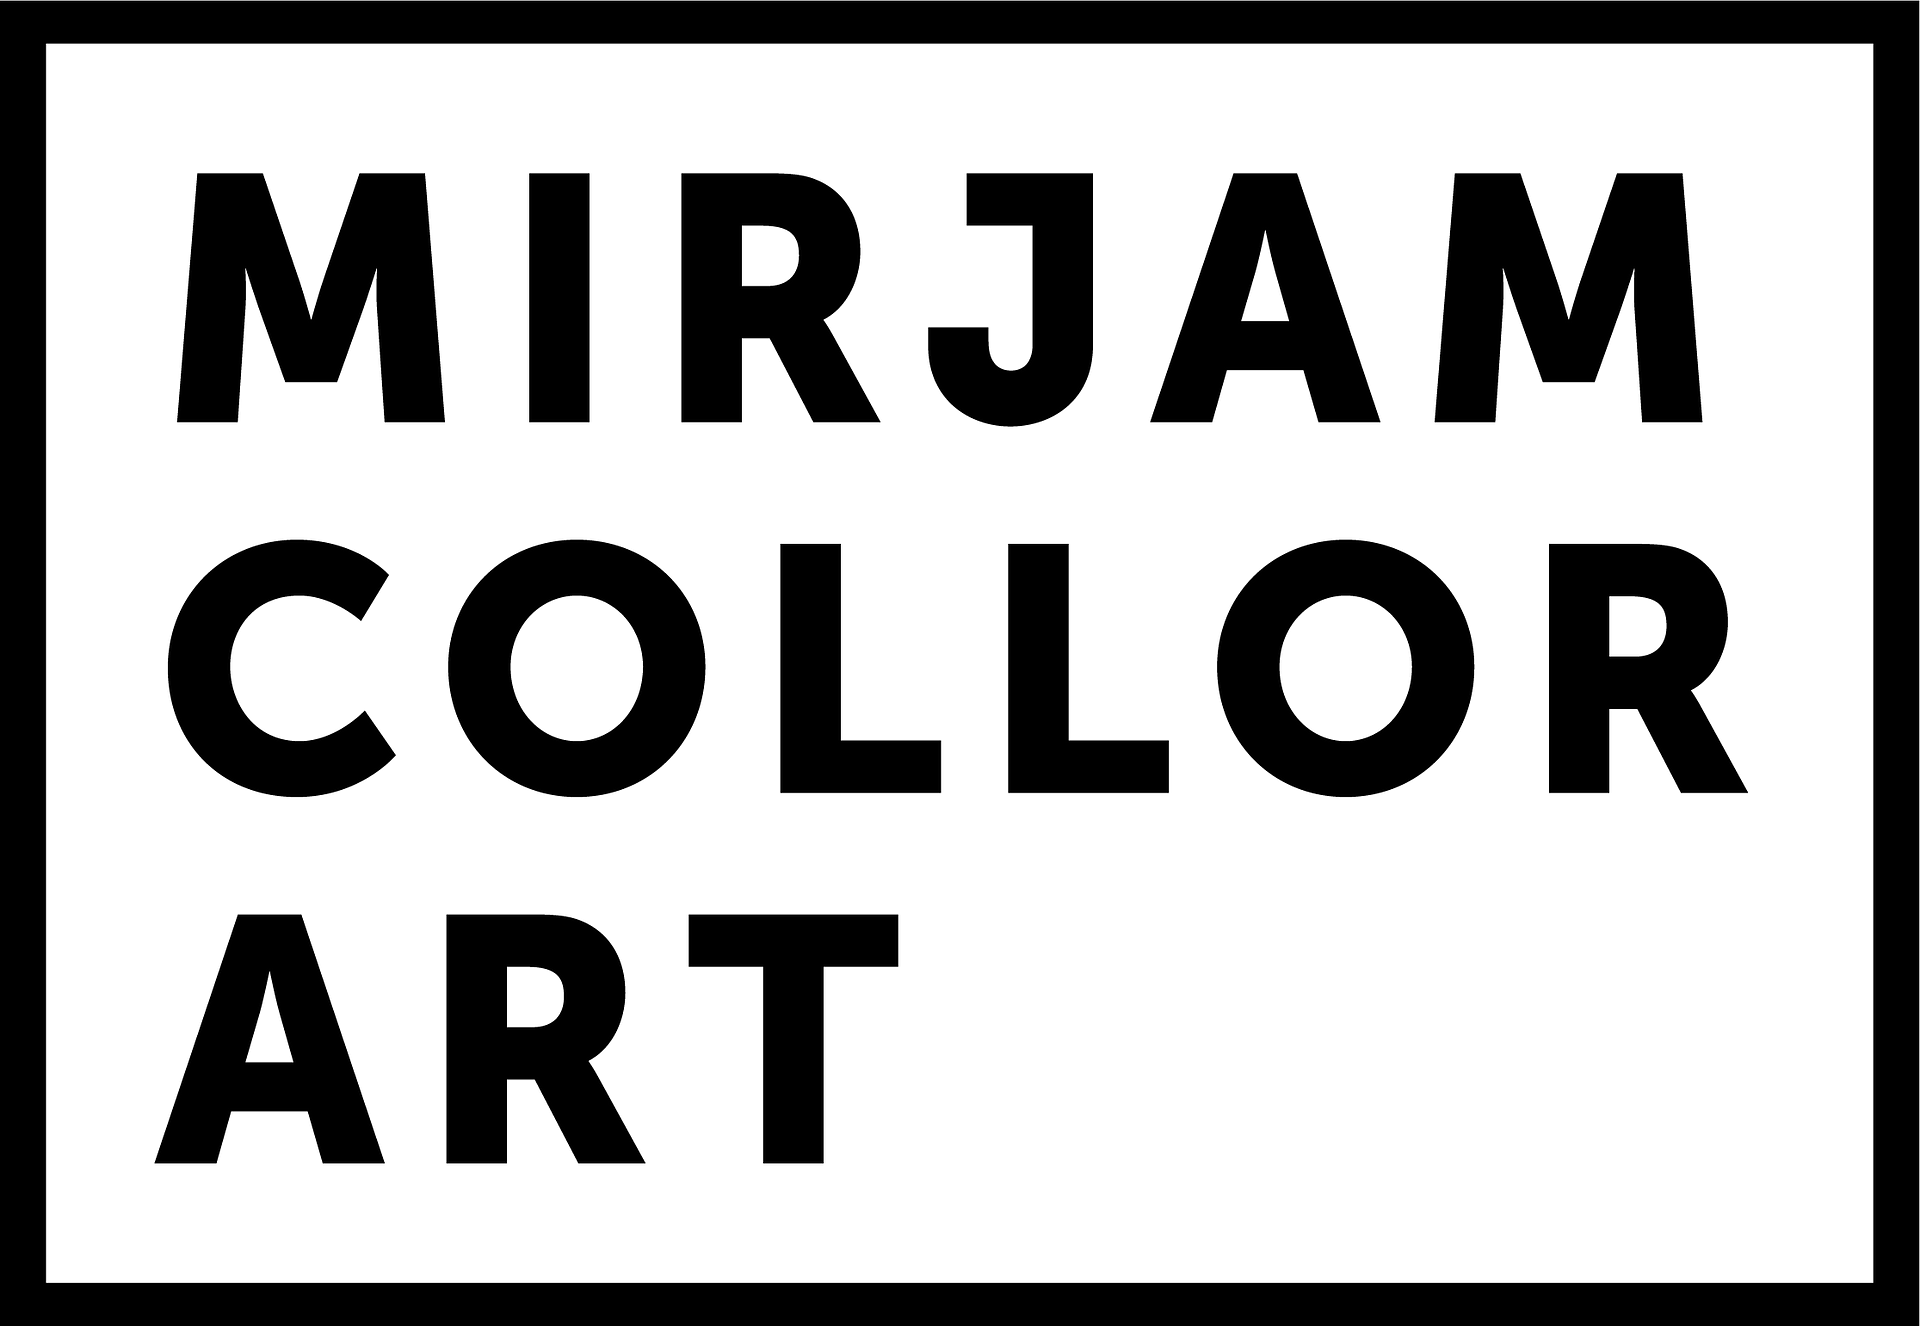 mico-art-logo